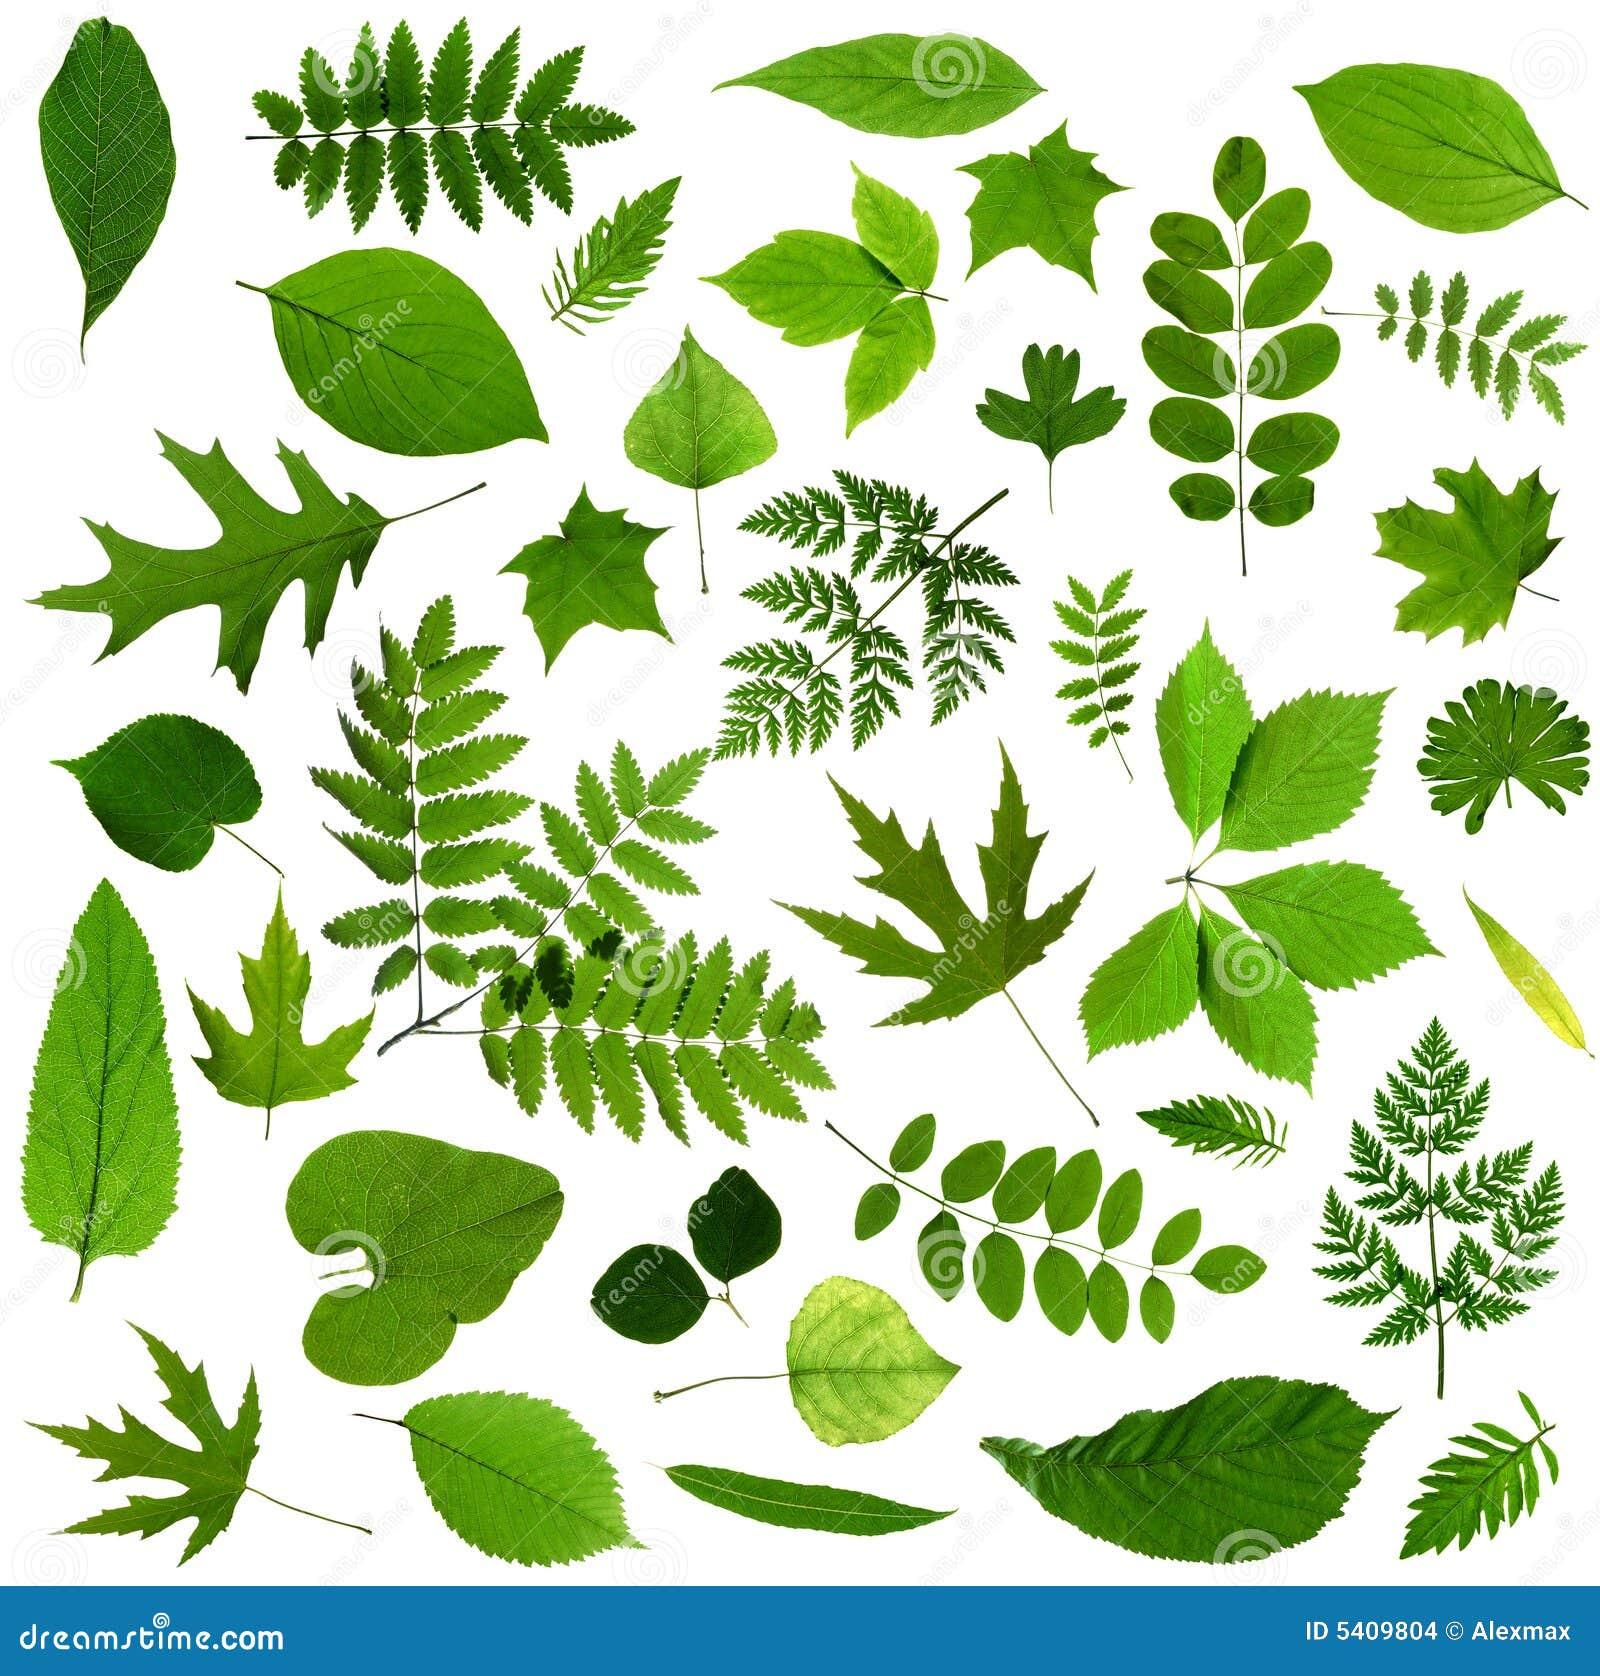 All sorts of green leaves stock photo image of silhouette for Nombres de arboles en ingles